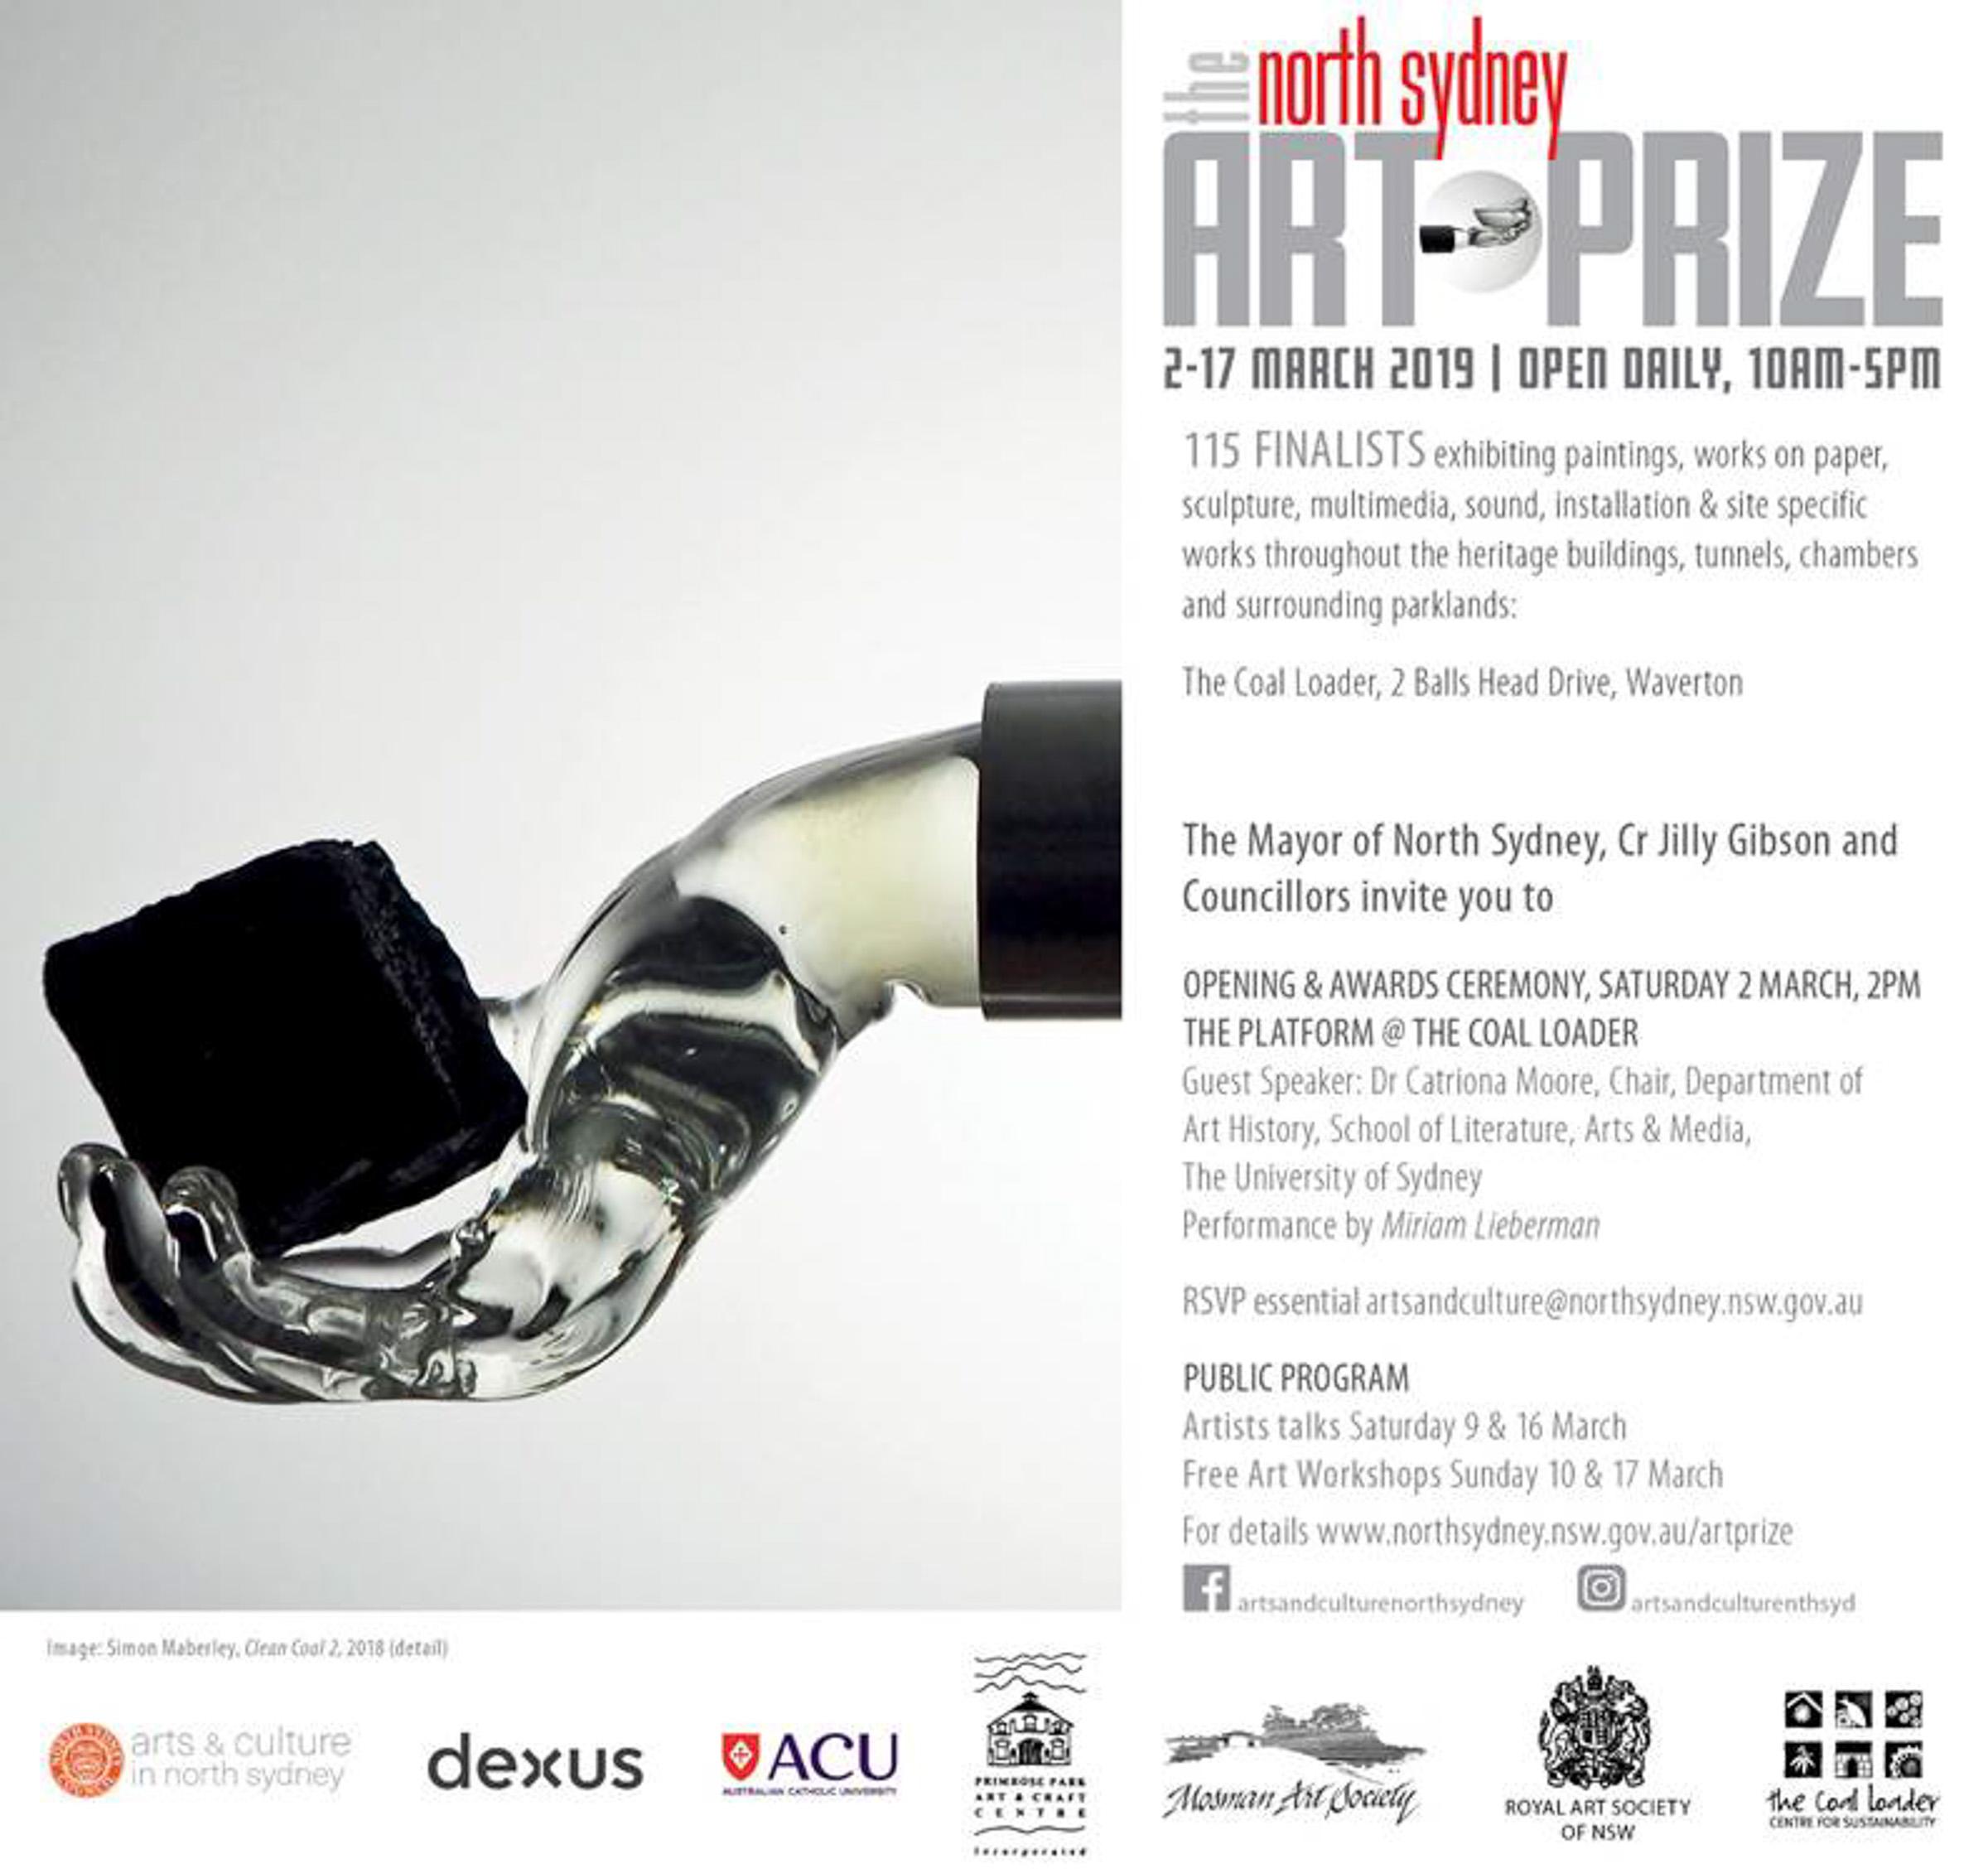 North Sydney Art Prize 2019 Invitation